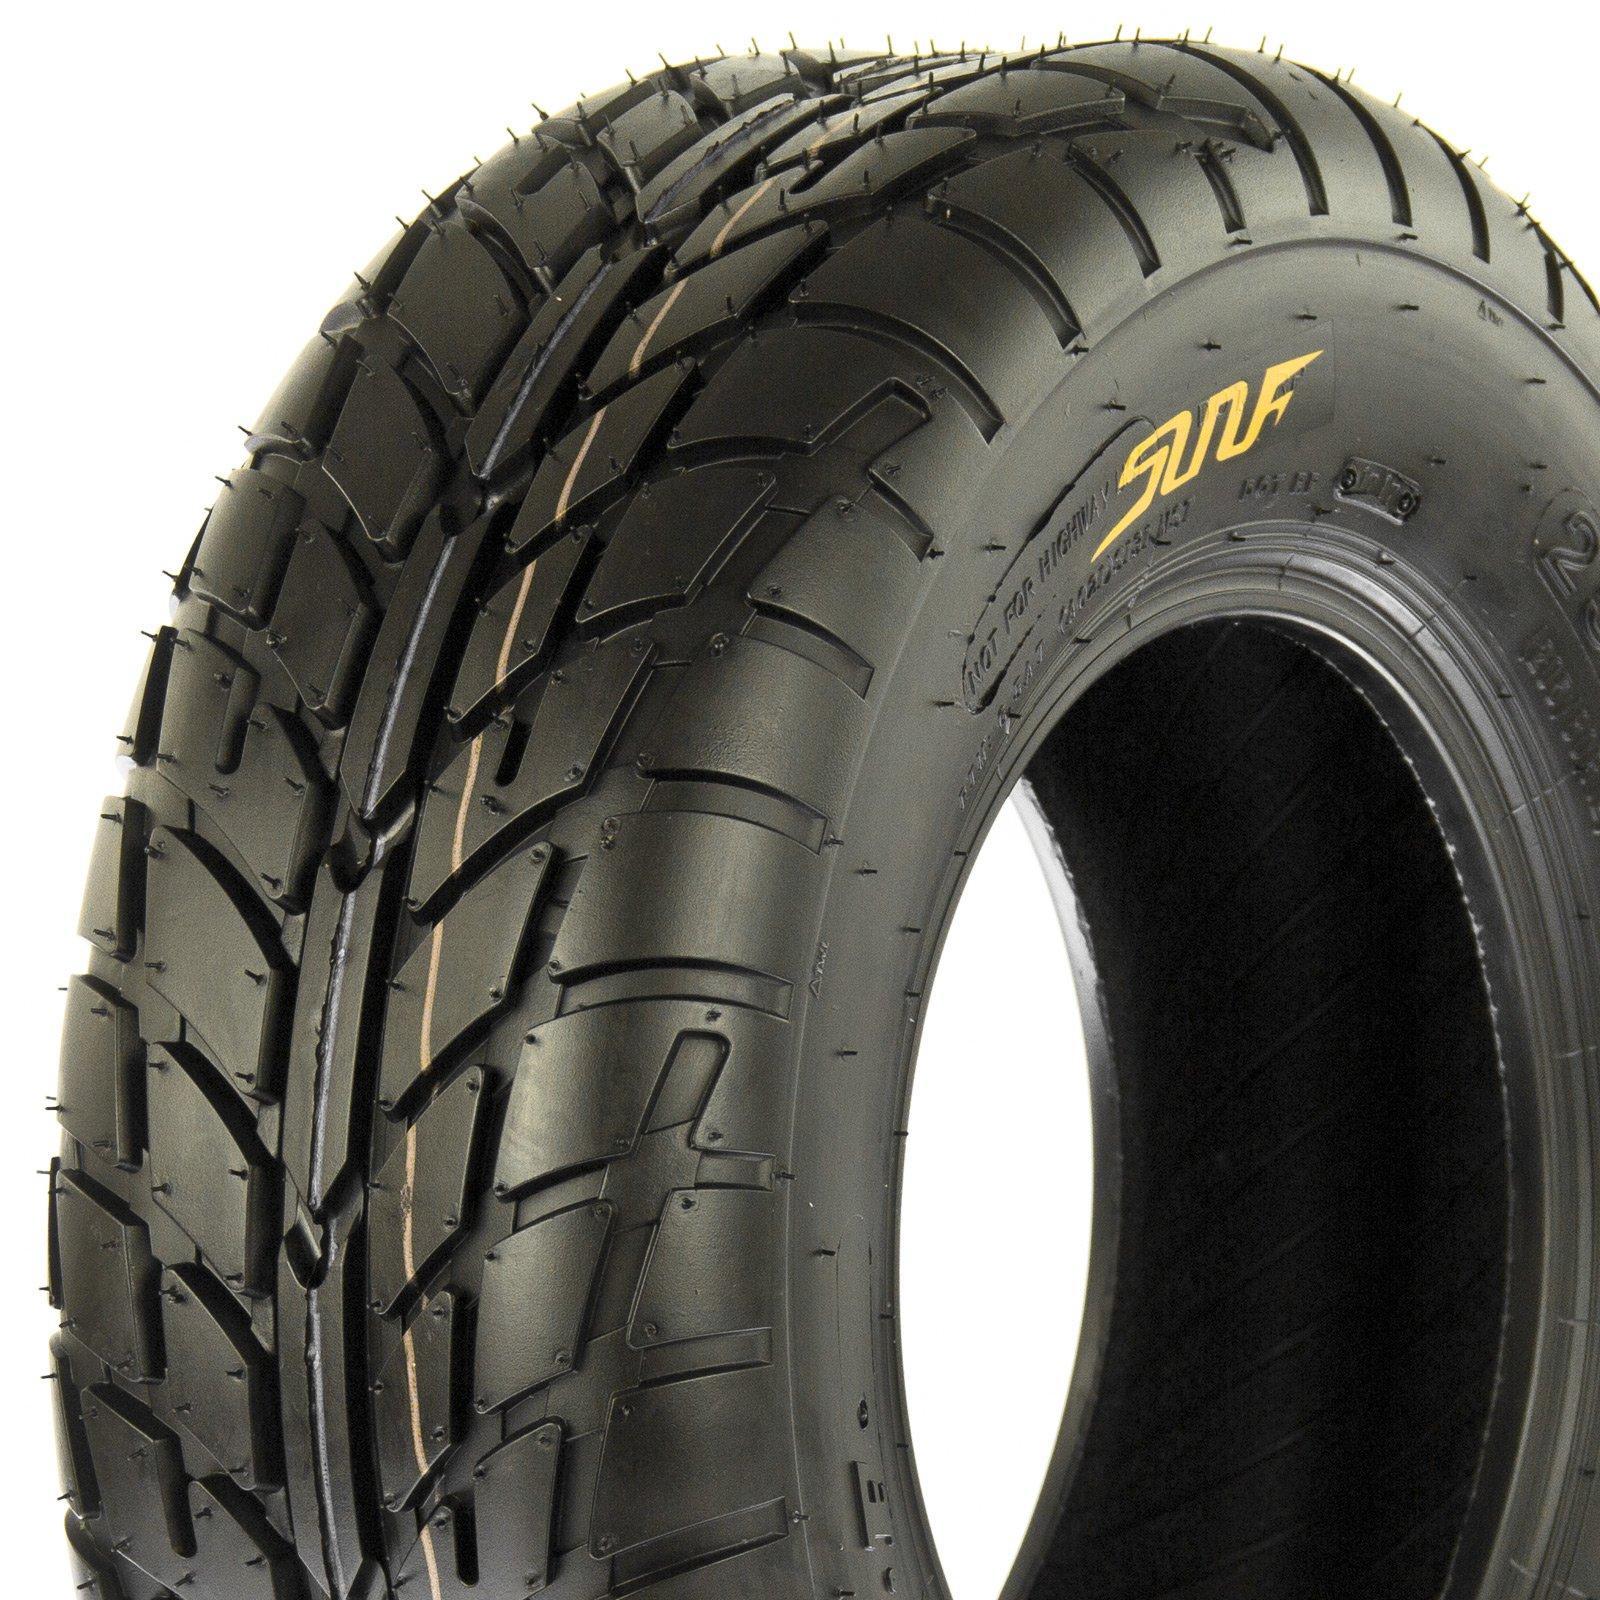 SunF Quad ATV Road Race Tires 225/45-10 225 45 10 4 PR A021 (Full set of 4) by SunF (Image #6)